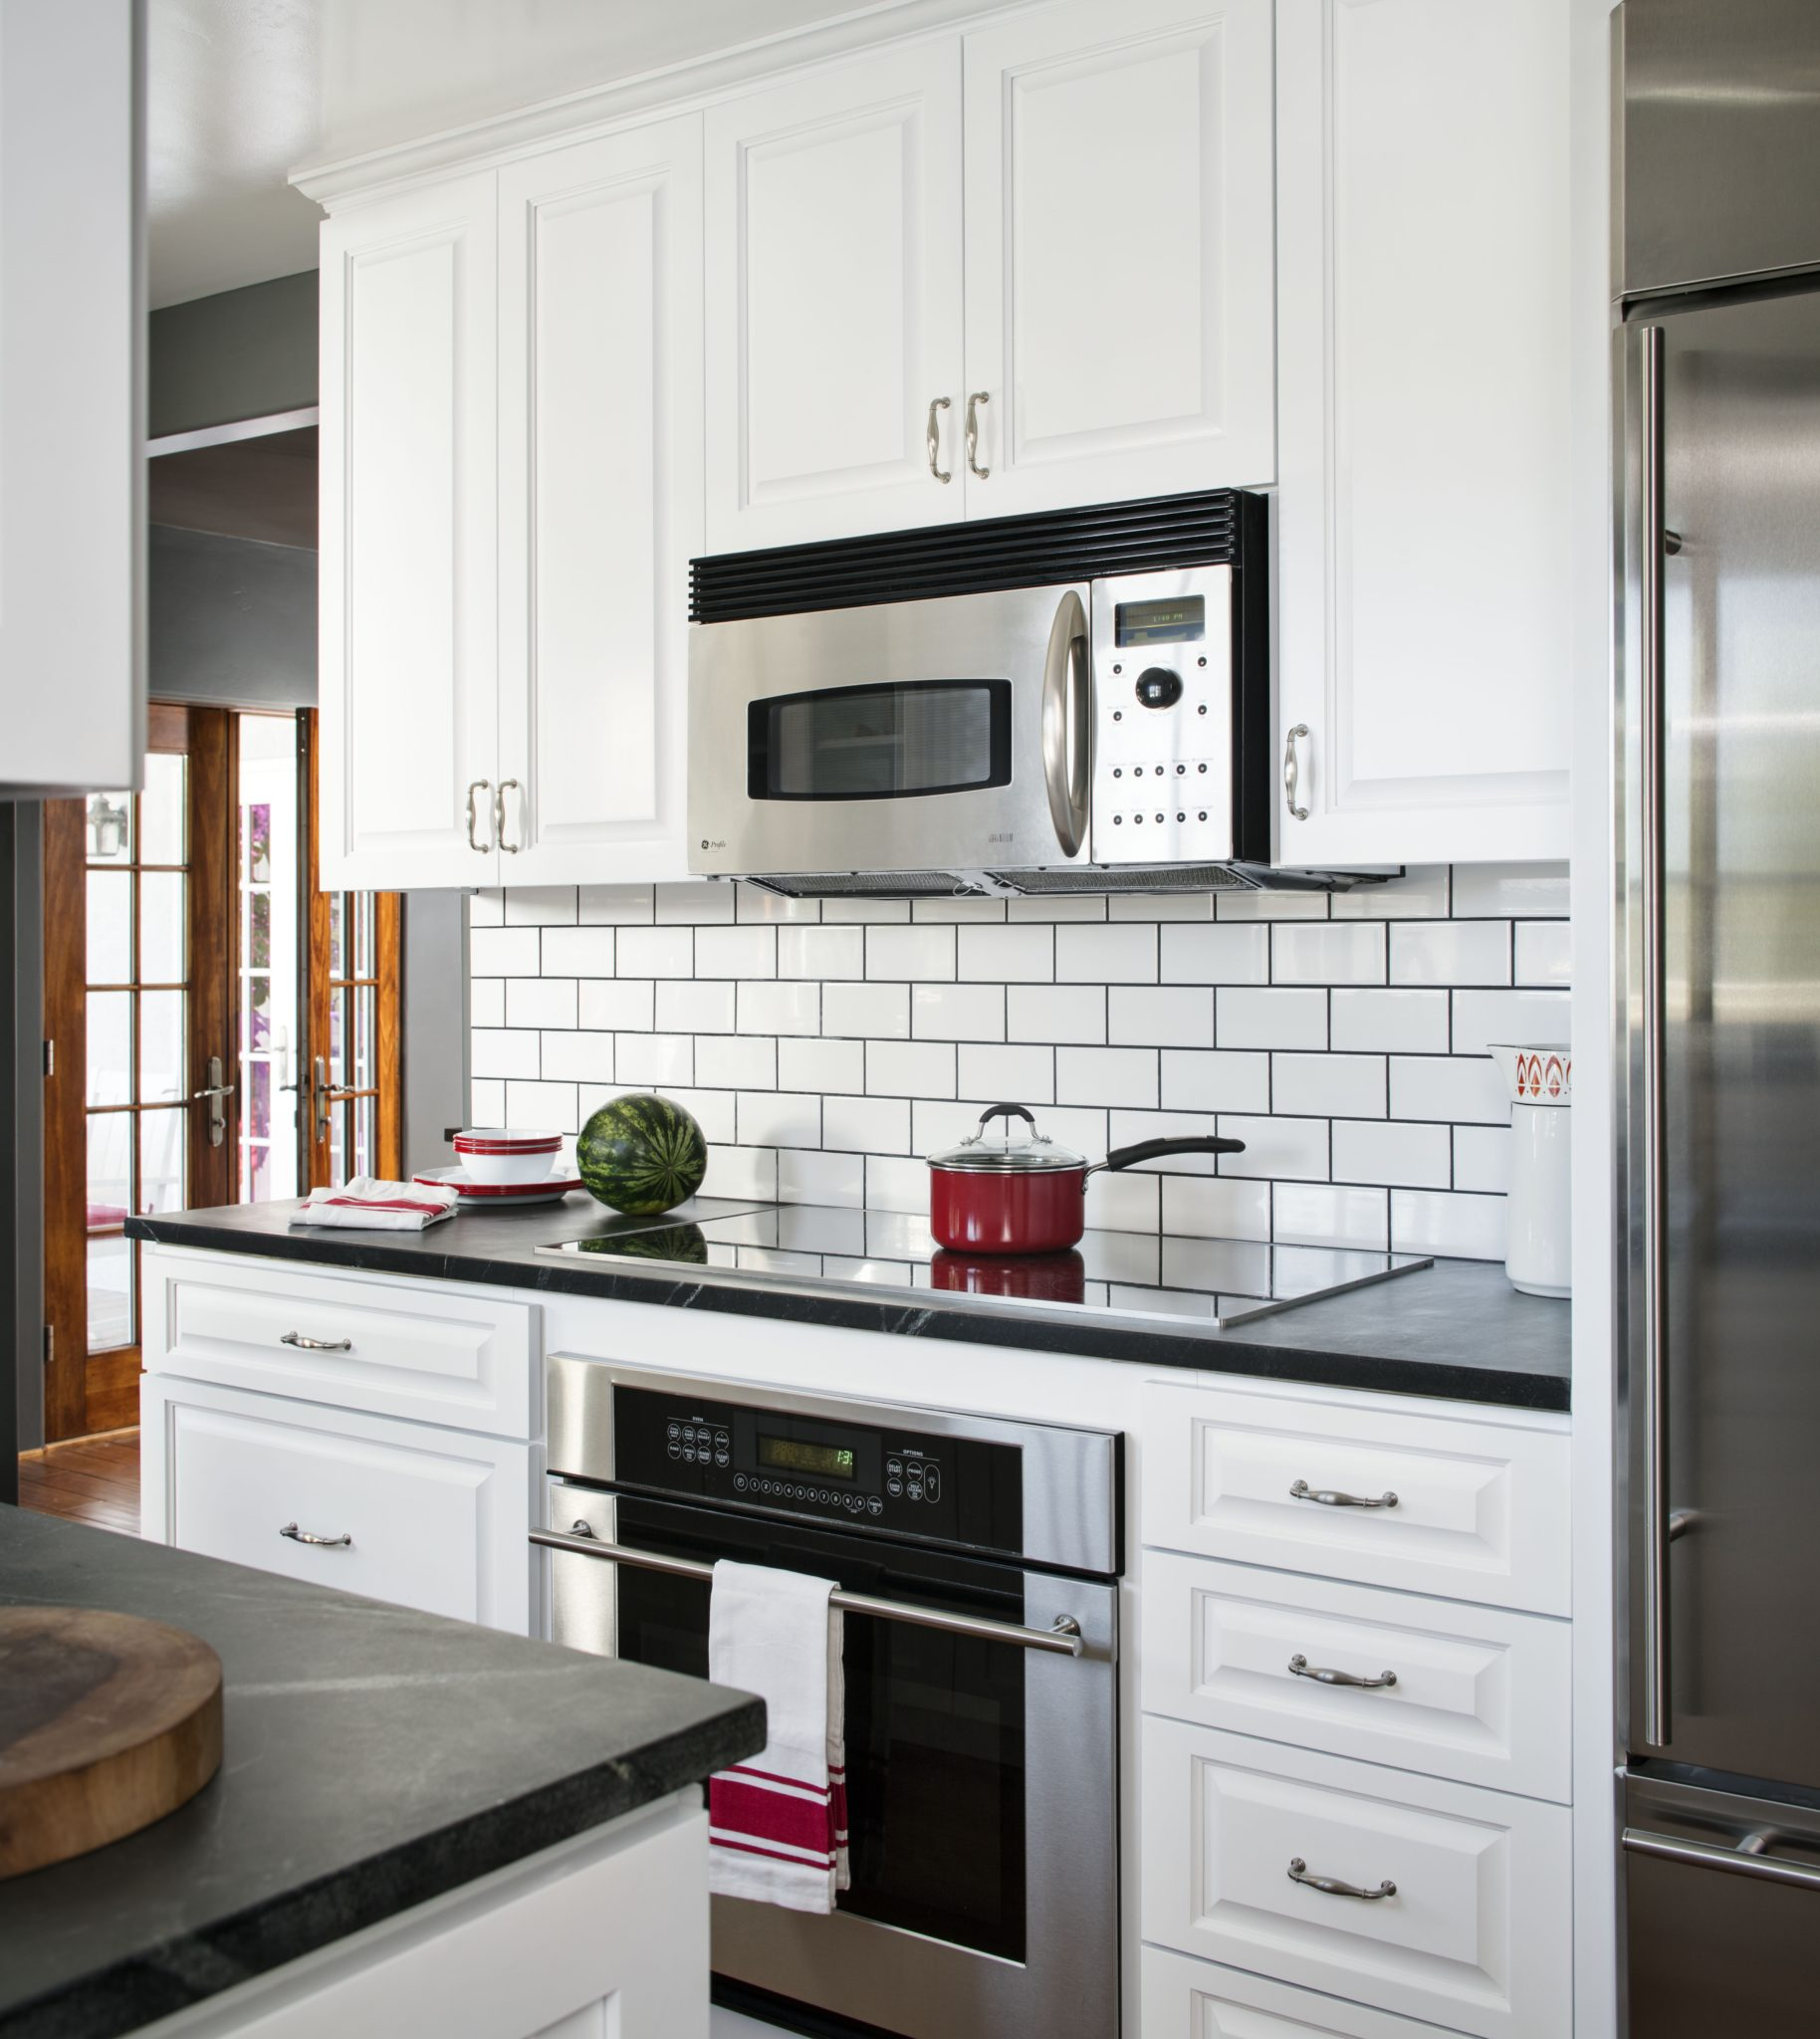 La Jolla beach cottage kitchen by CM Natural Designs